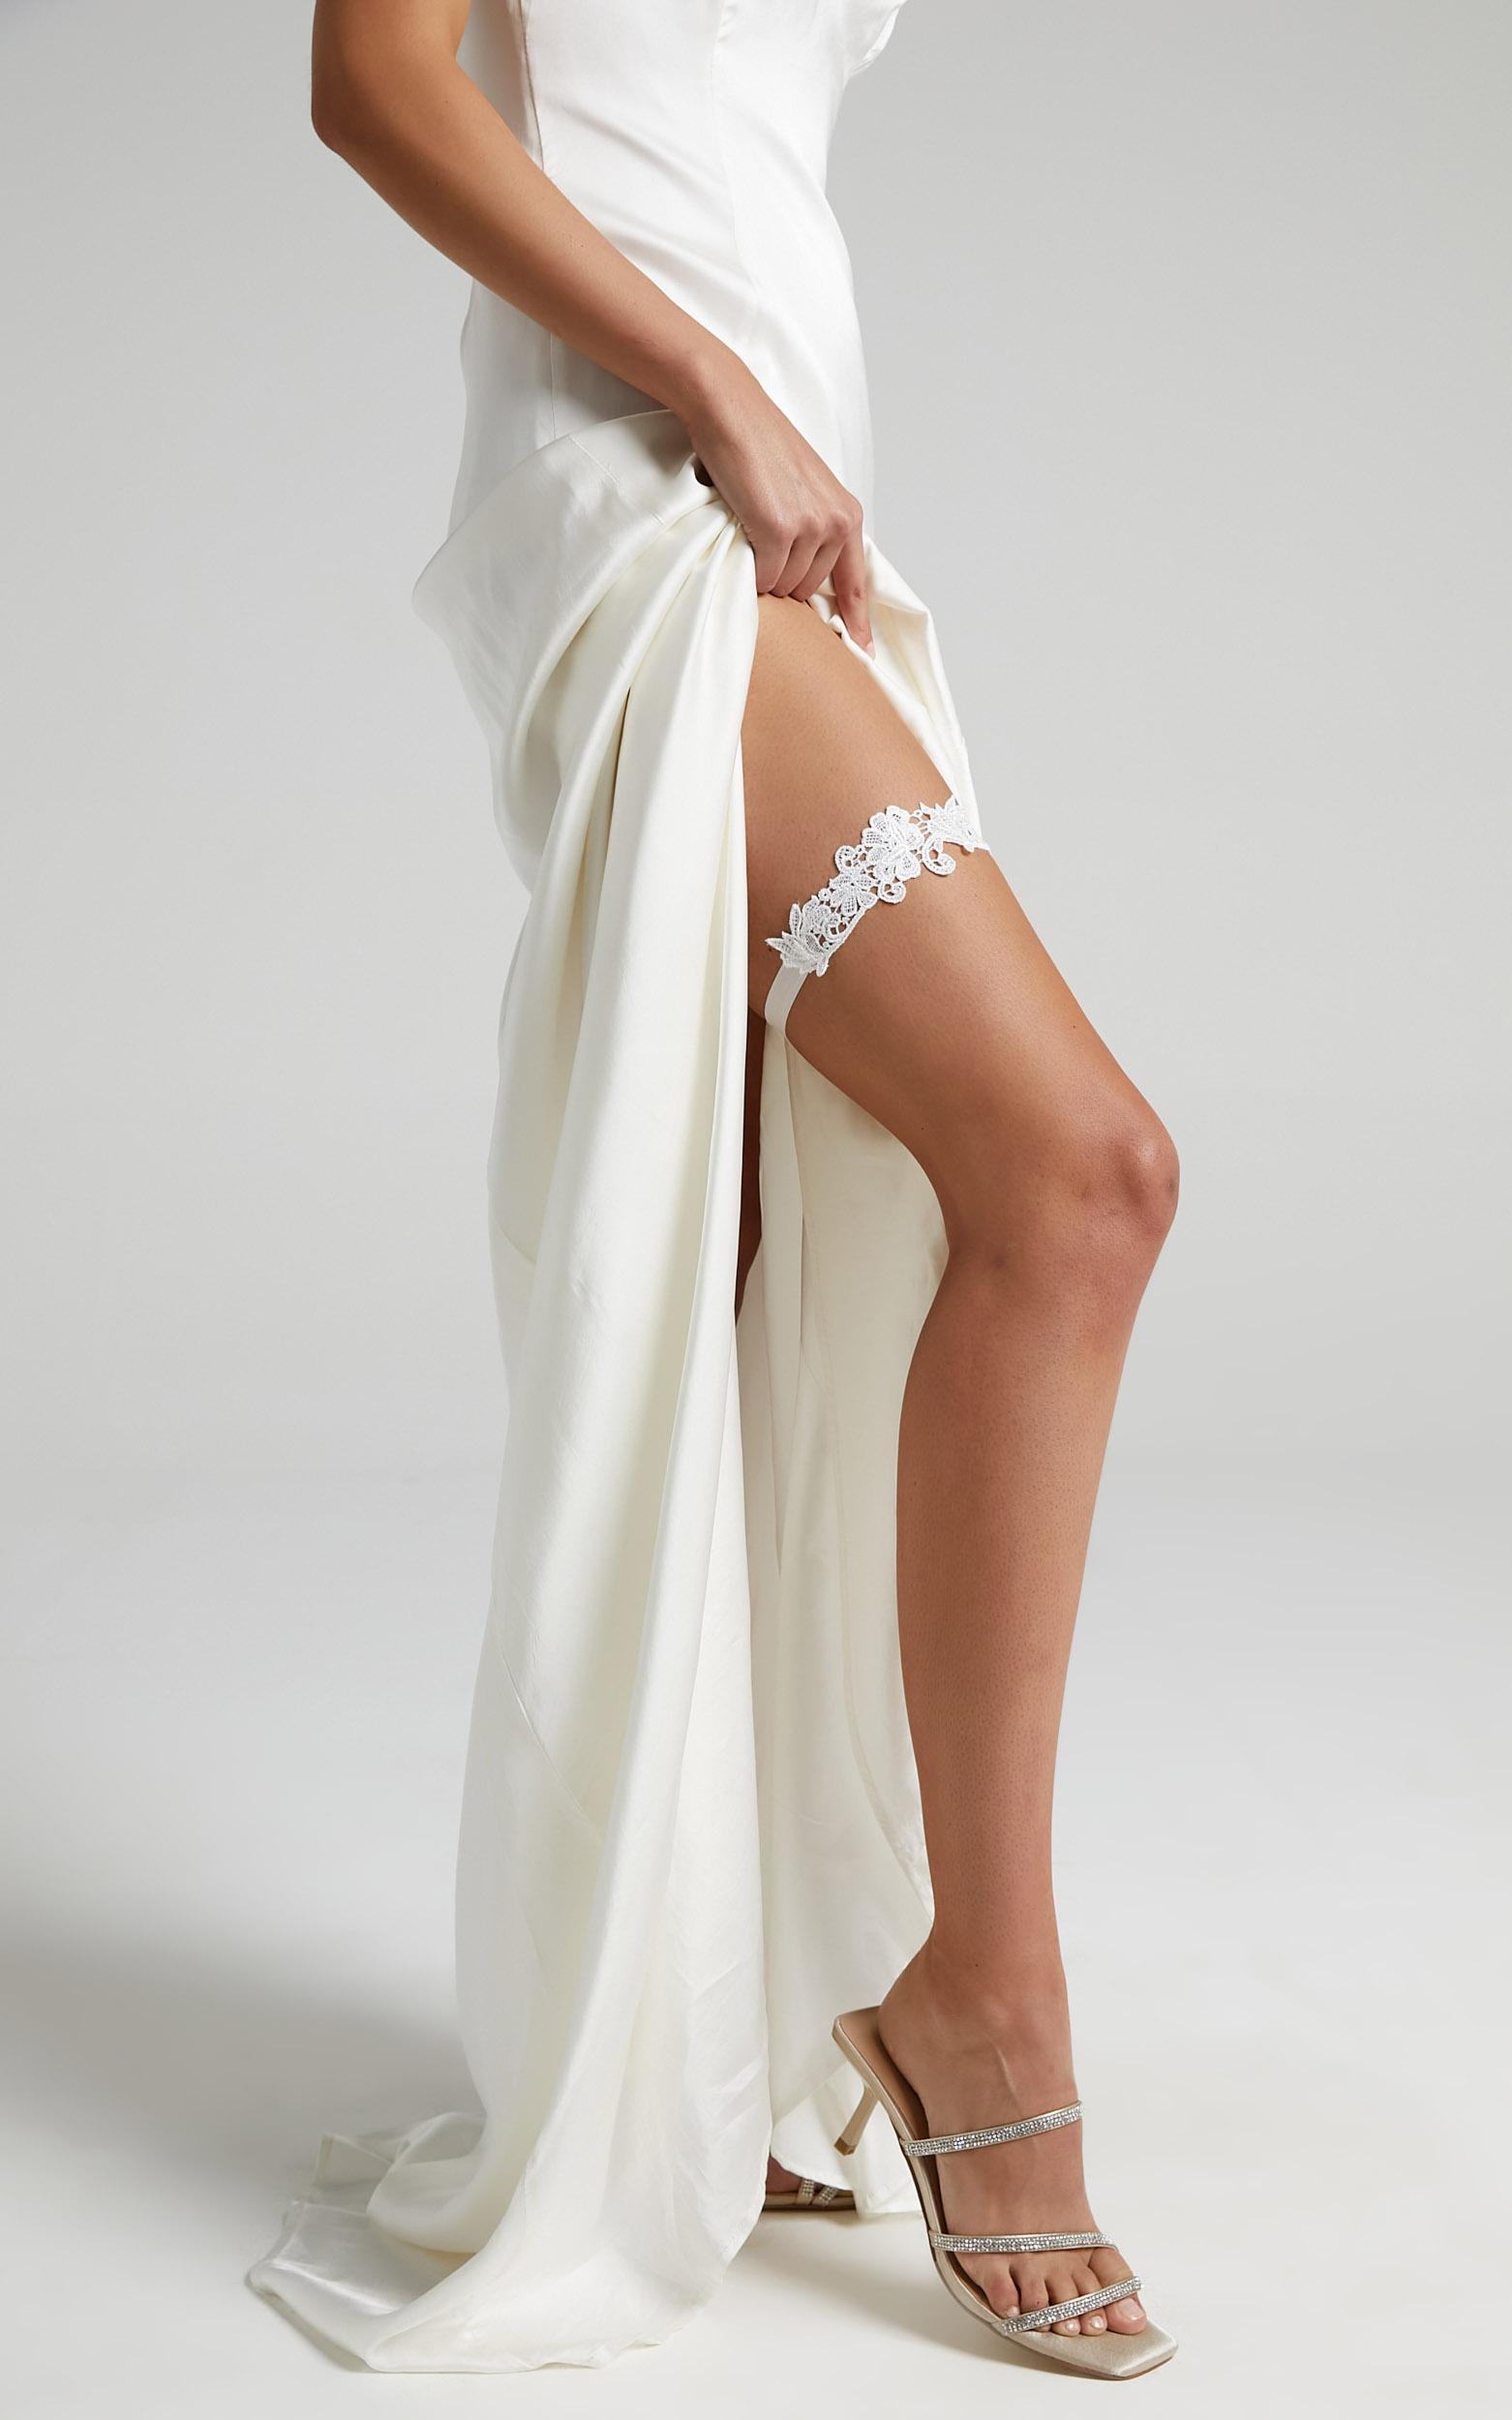 Free Falling Garter in White, , hi-res image number null